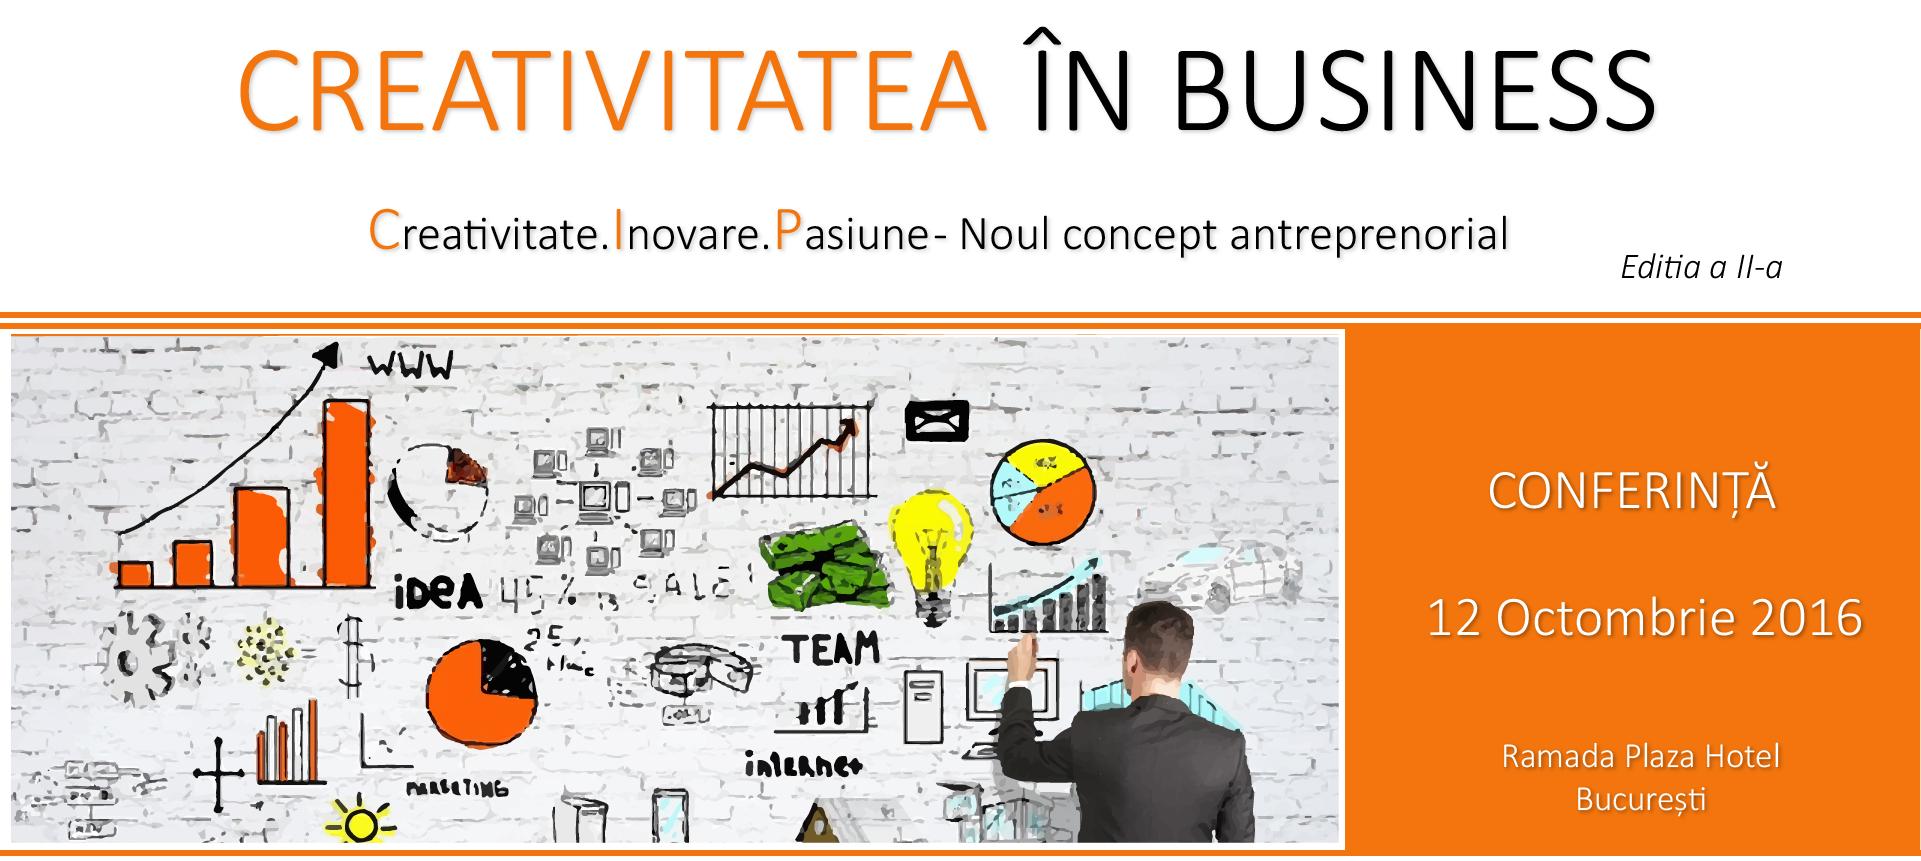 BANNER  Creativitatea In Business